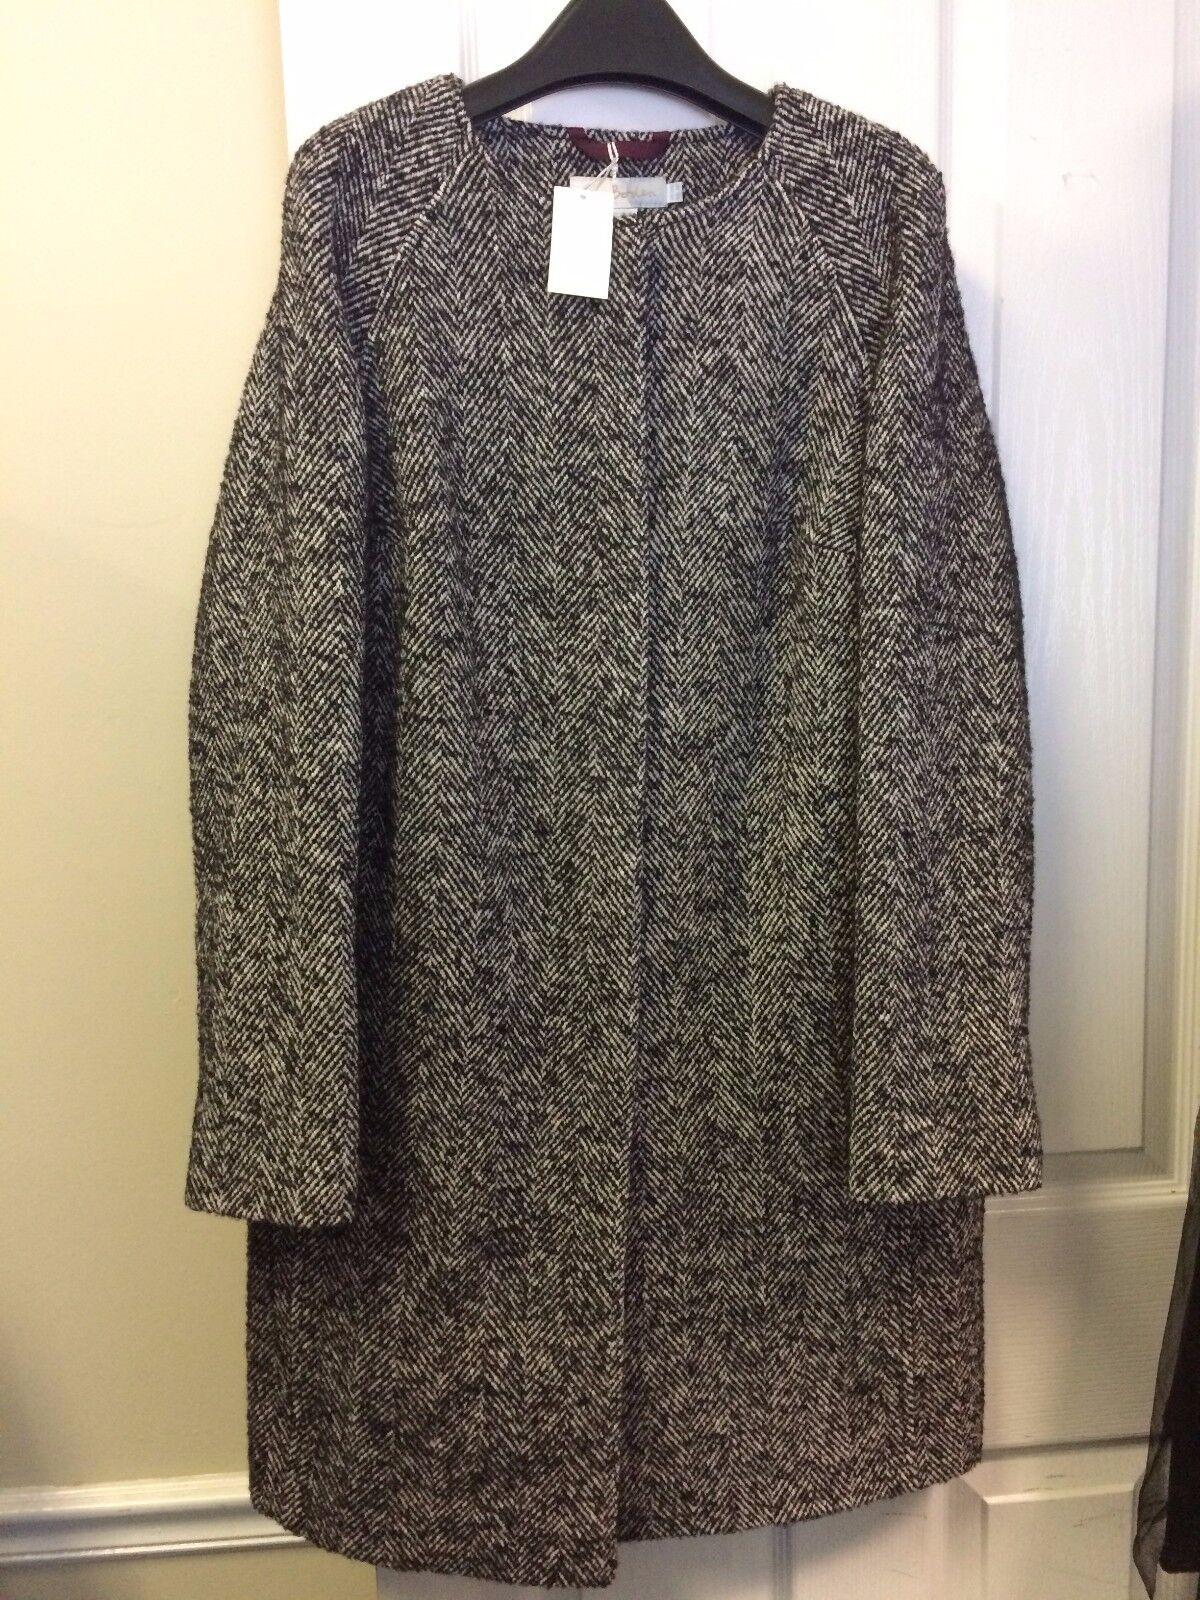 Boden Sienna Herringbone Coat Size US 4R Wool Blend